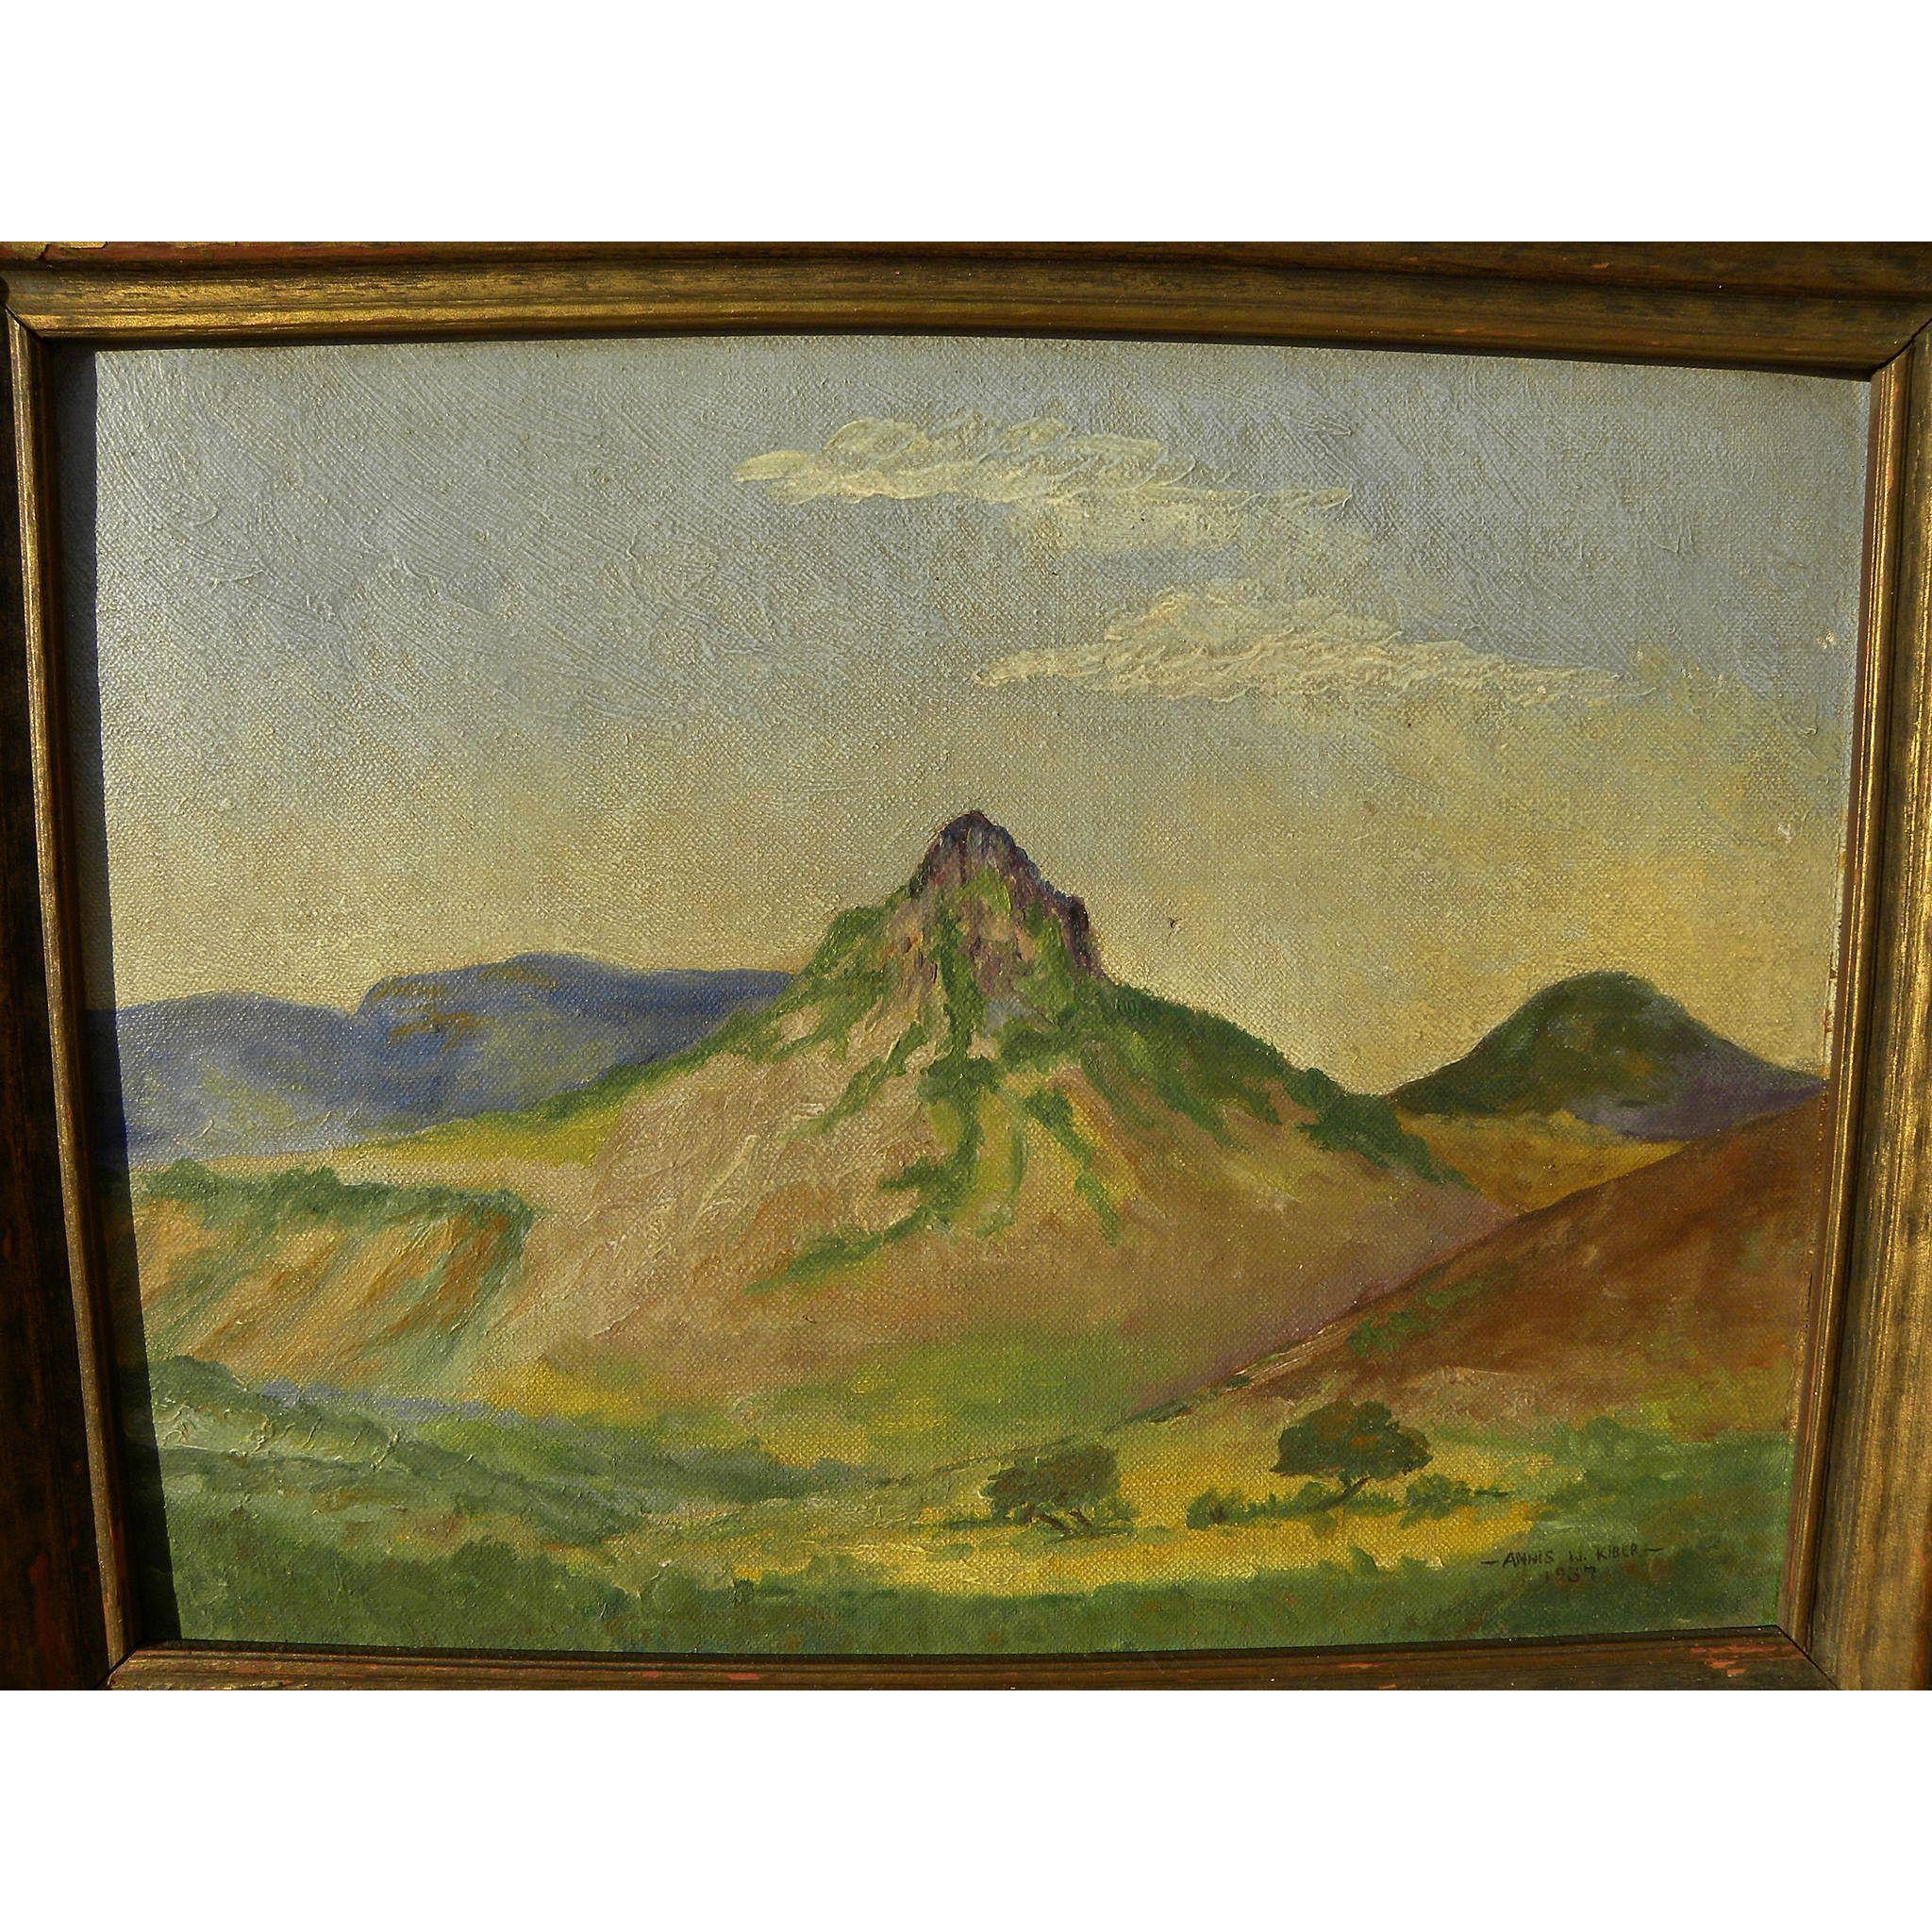 West Texas vintage art 1937 signed painting of Mitre Peak